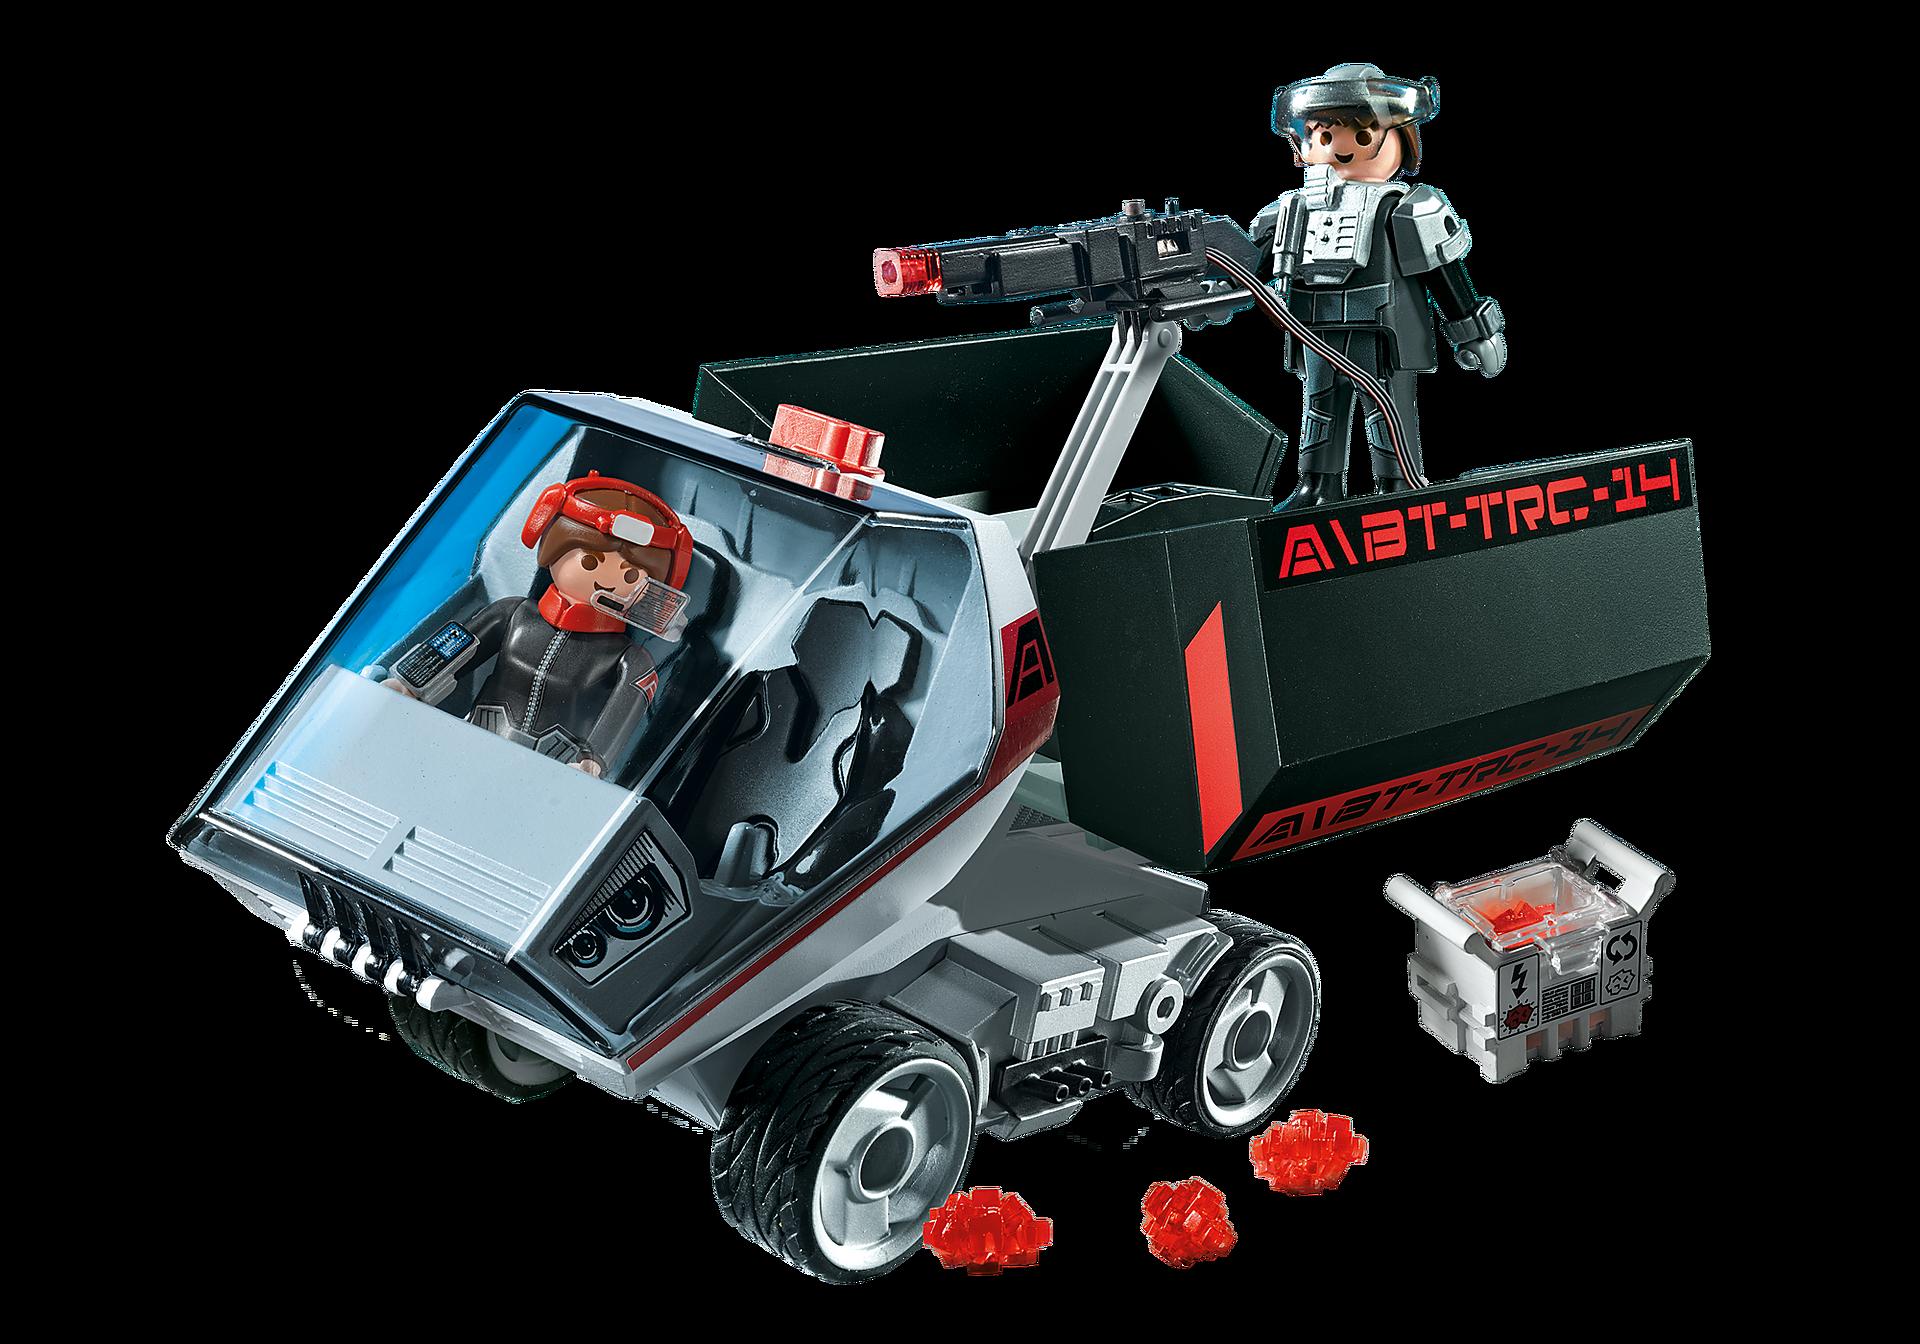 http://media.playmobil.com/i/playmobil/5154_product_detail/Darksters Truck mit K.O.-Leuchtkanone